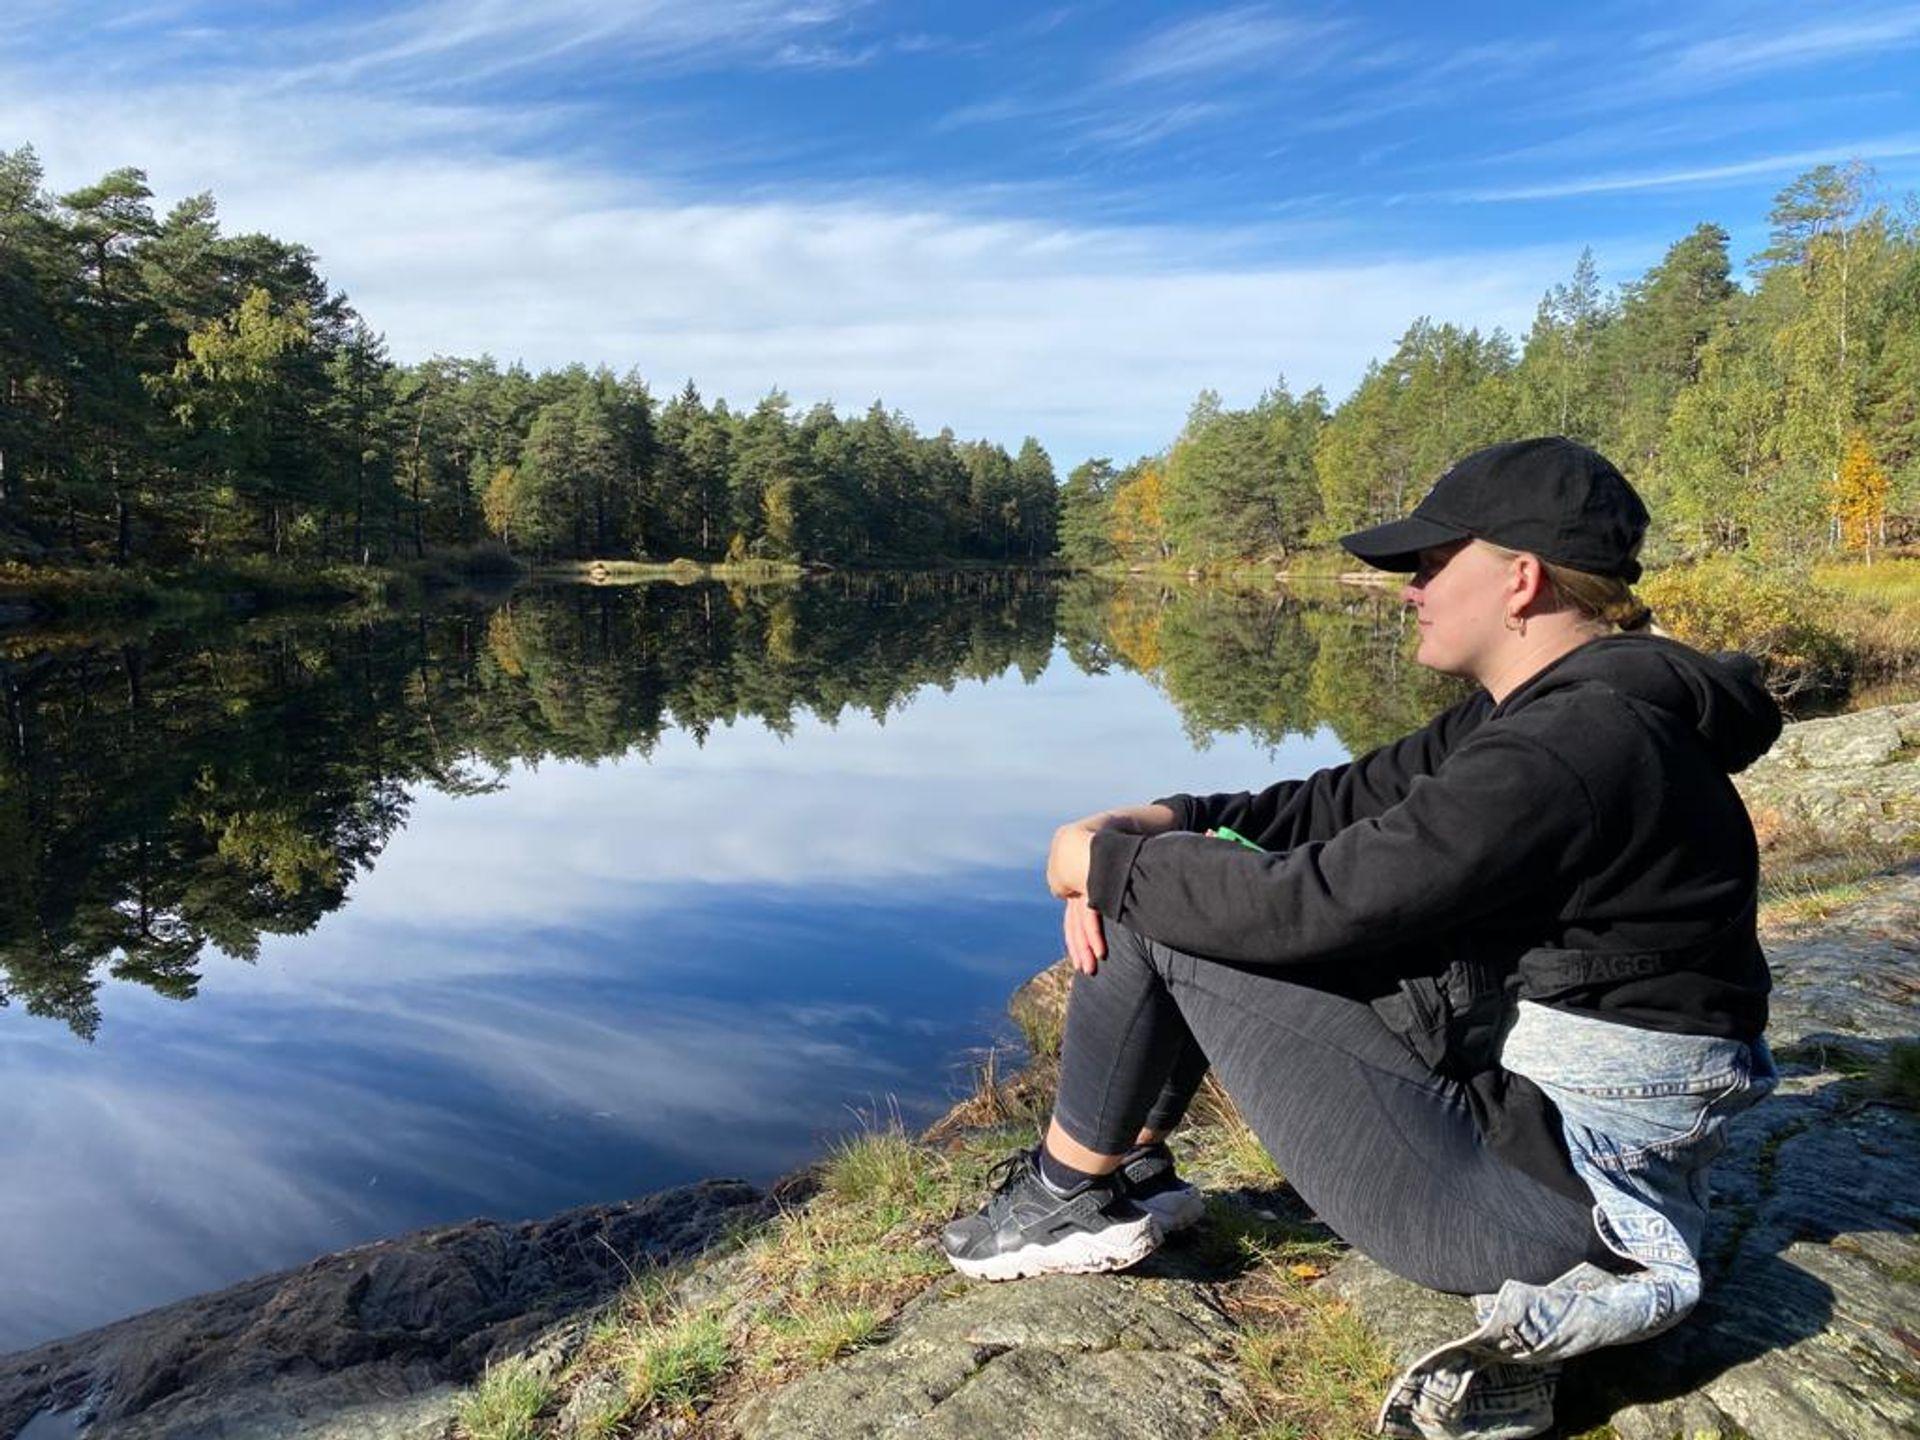 Brooke sitting alongside a lake surrounded by trees